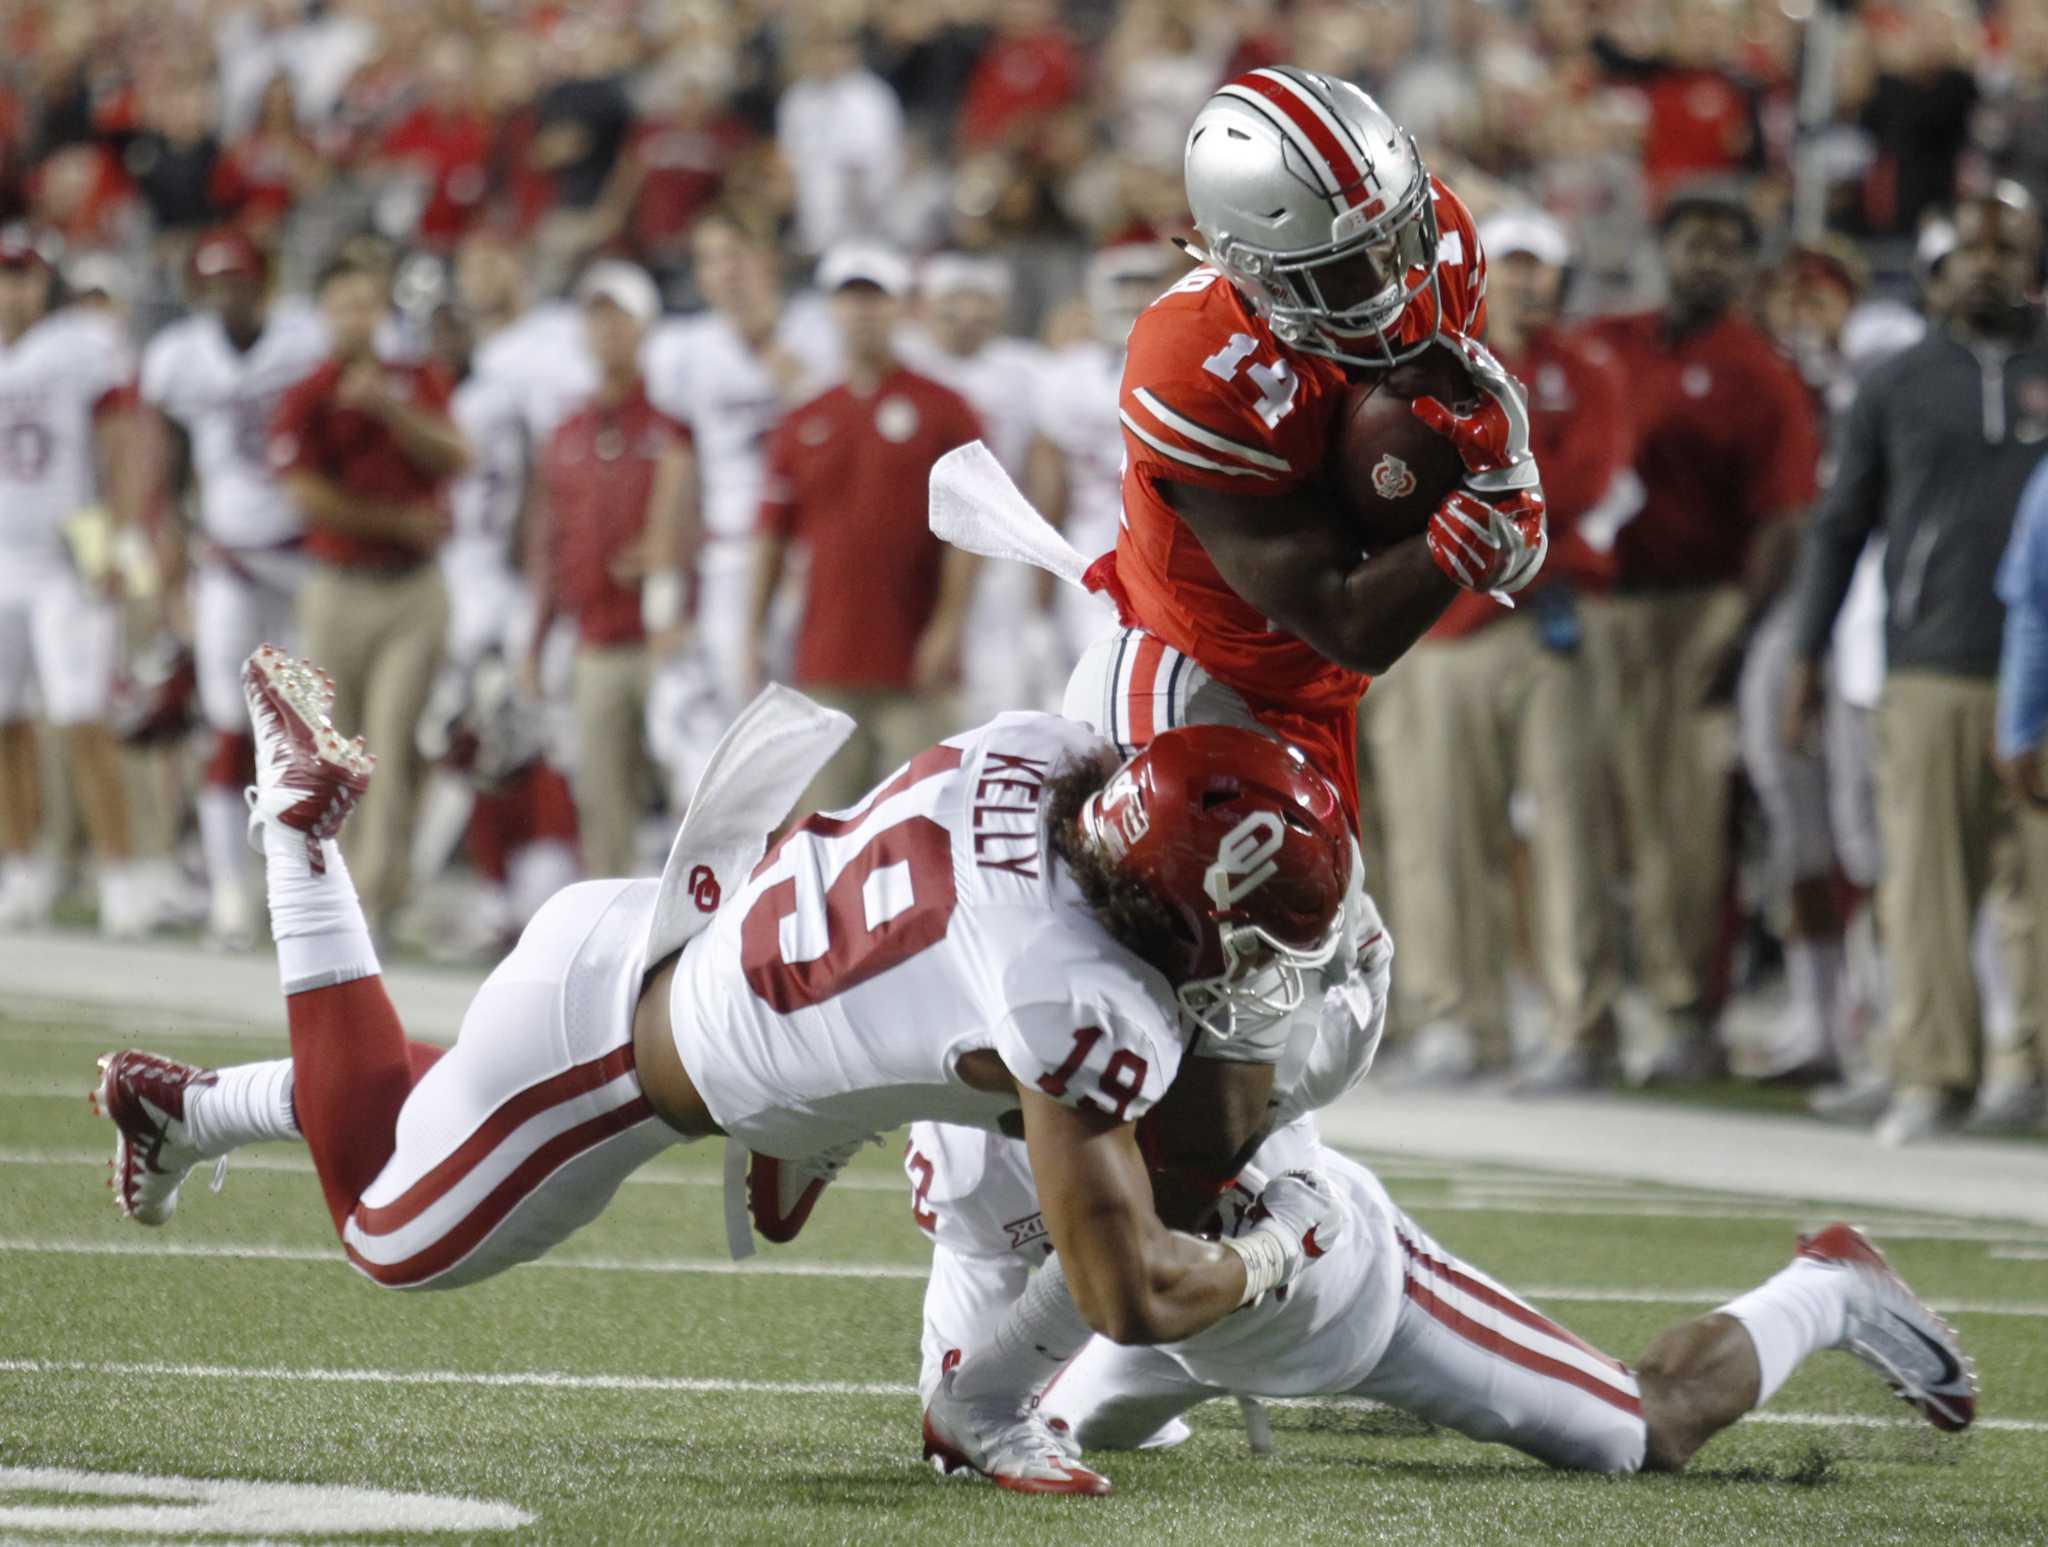 Top 25: Oklahoma tops Ohio State; Clemson 'D' stifles Auburn